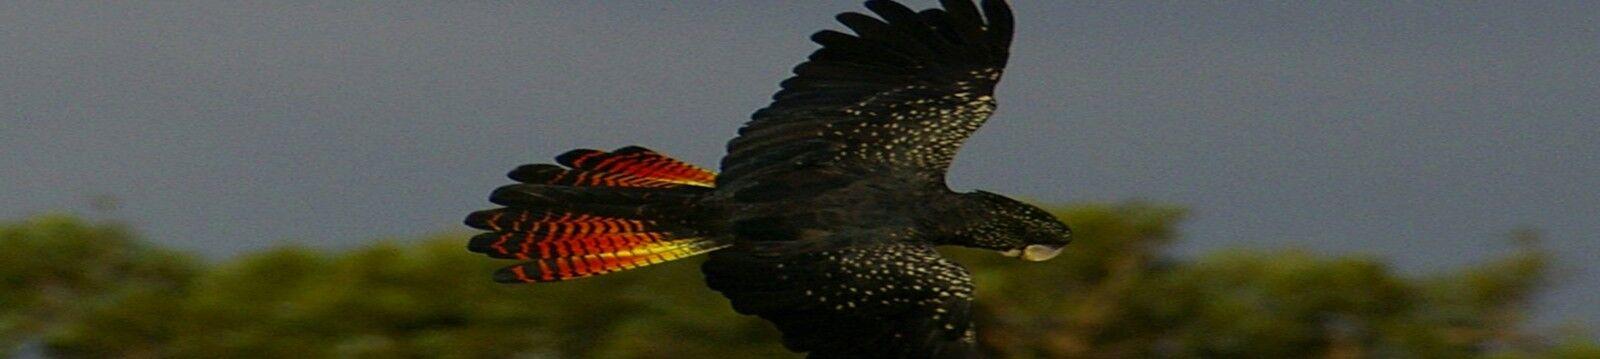 Red Tail Australia